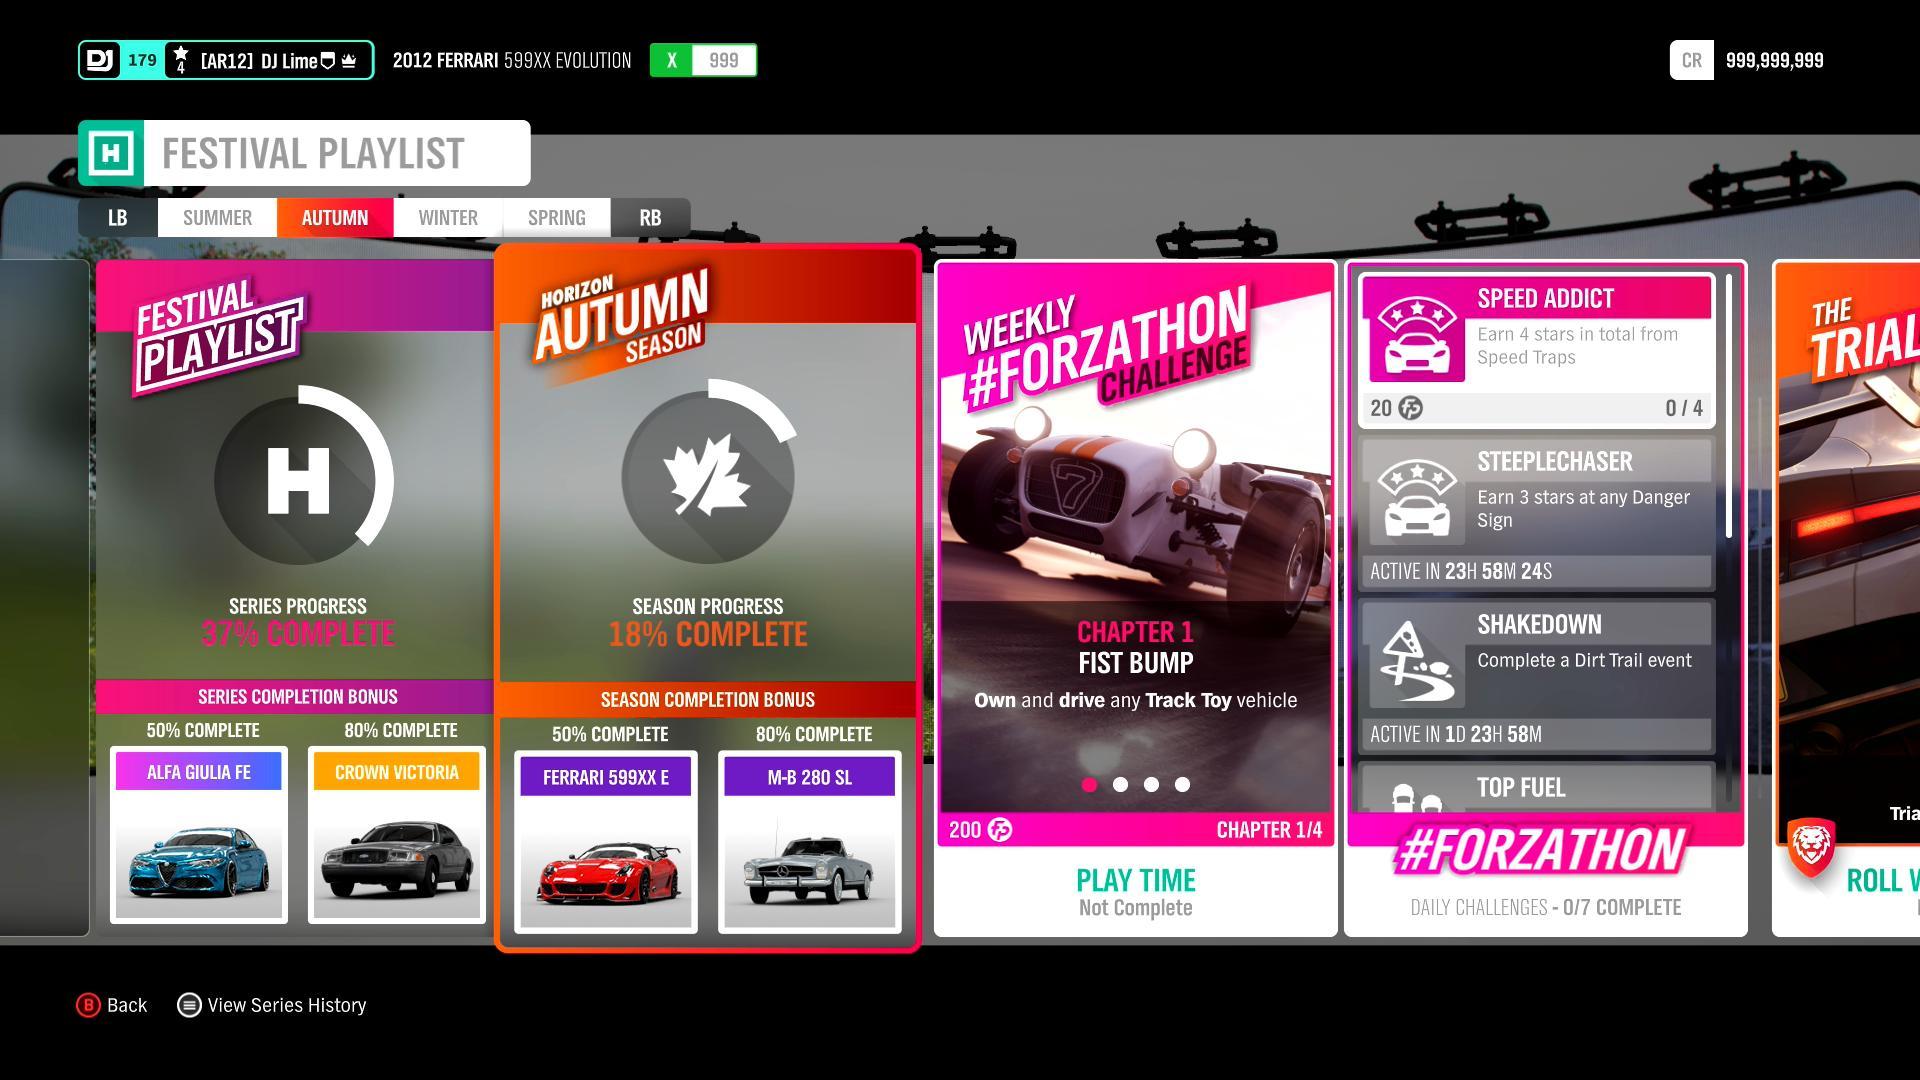 Emil Straher On Twitter Forzahorizon4 Forzathon Main Seasonal Items To Look For Ferrari 599xx E New To Fh4 Mercedes Benz 280 Sl Other Weekly Rewards Plymouth Fury New To